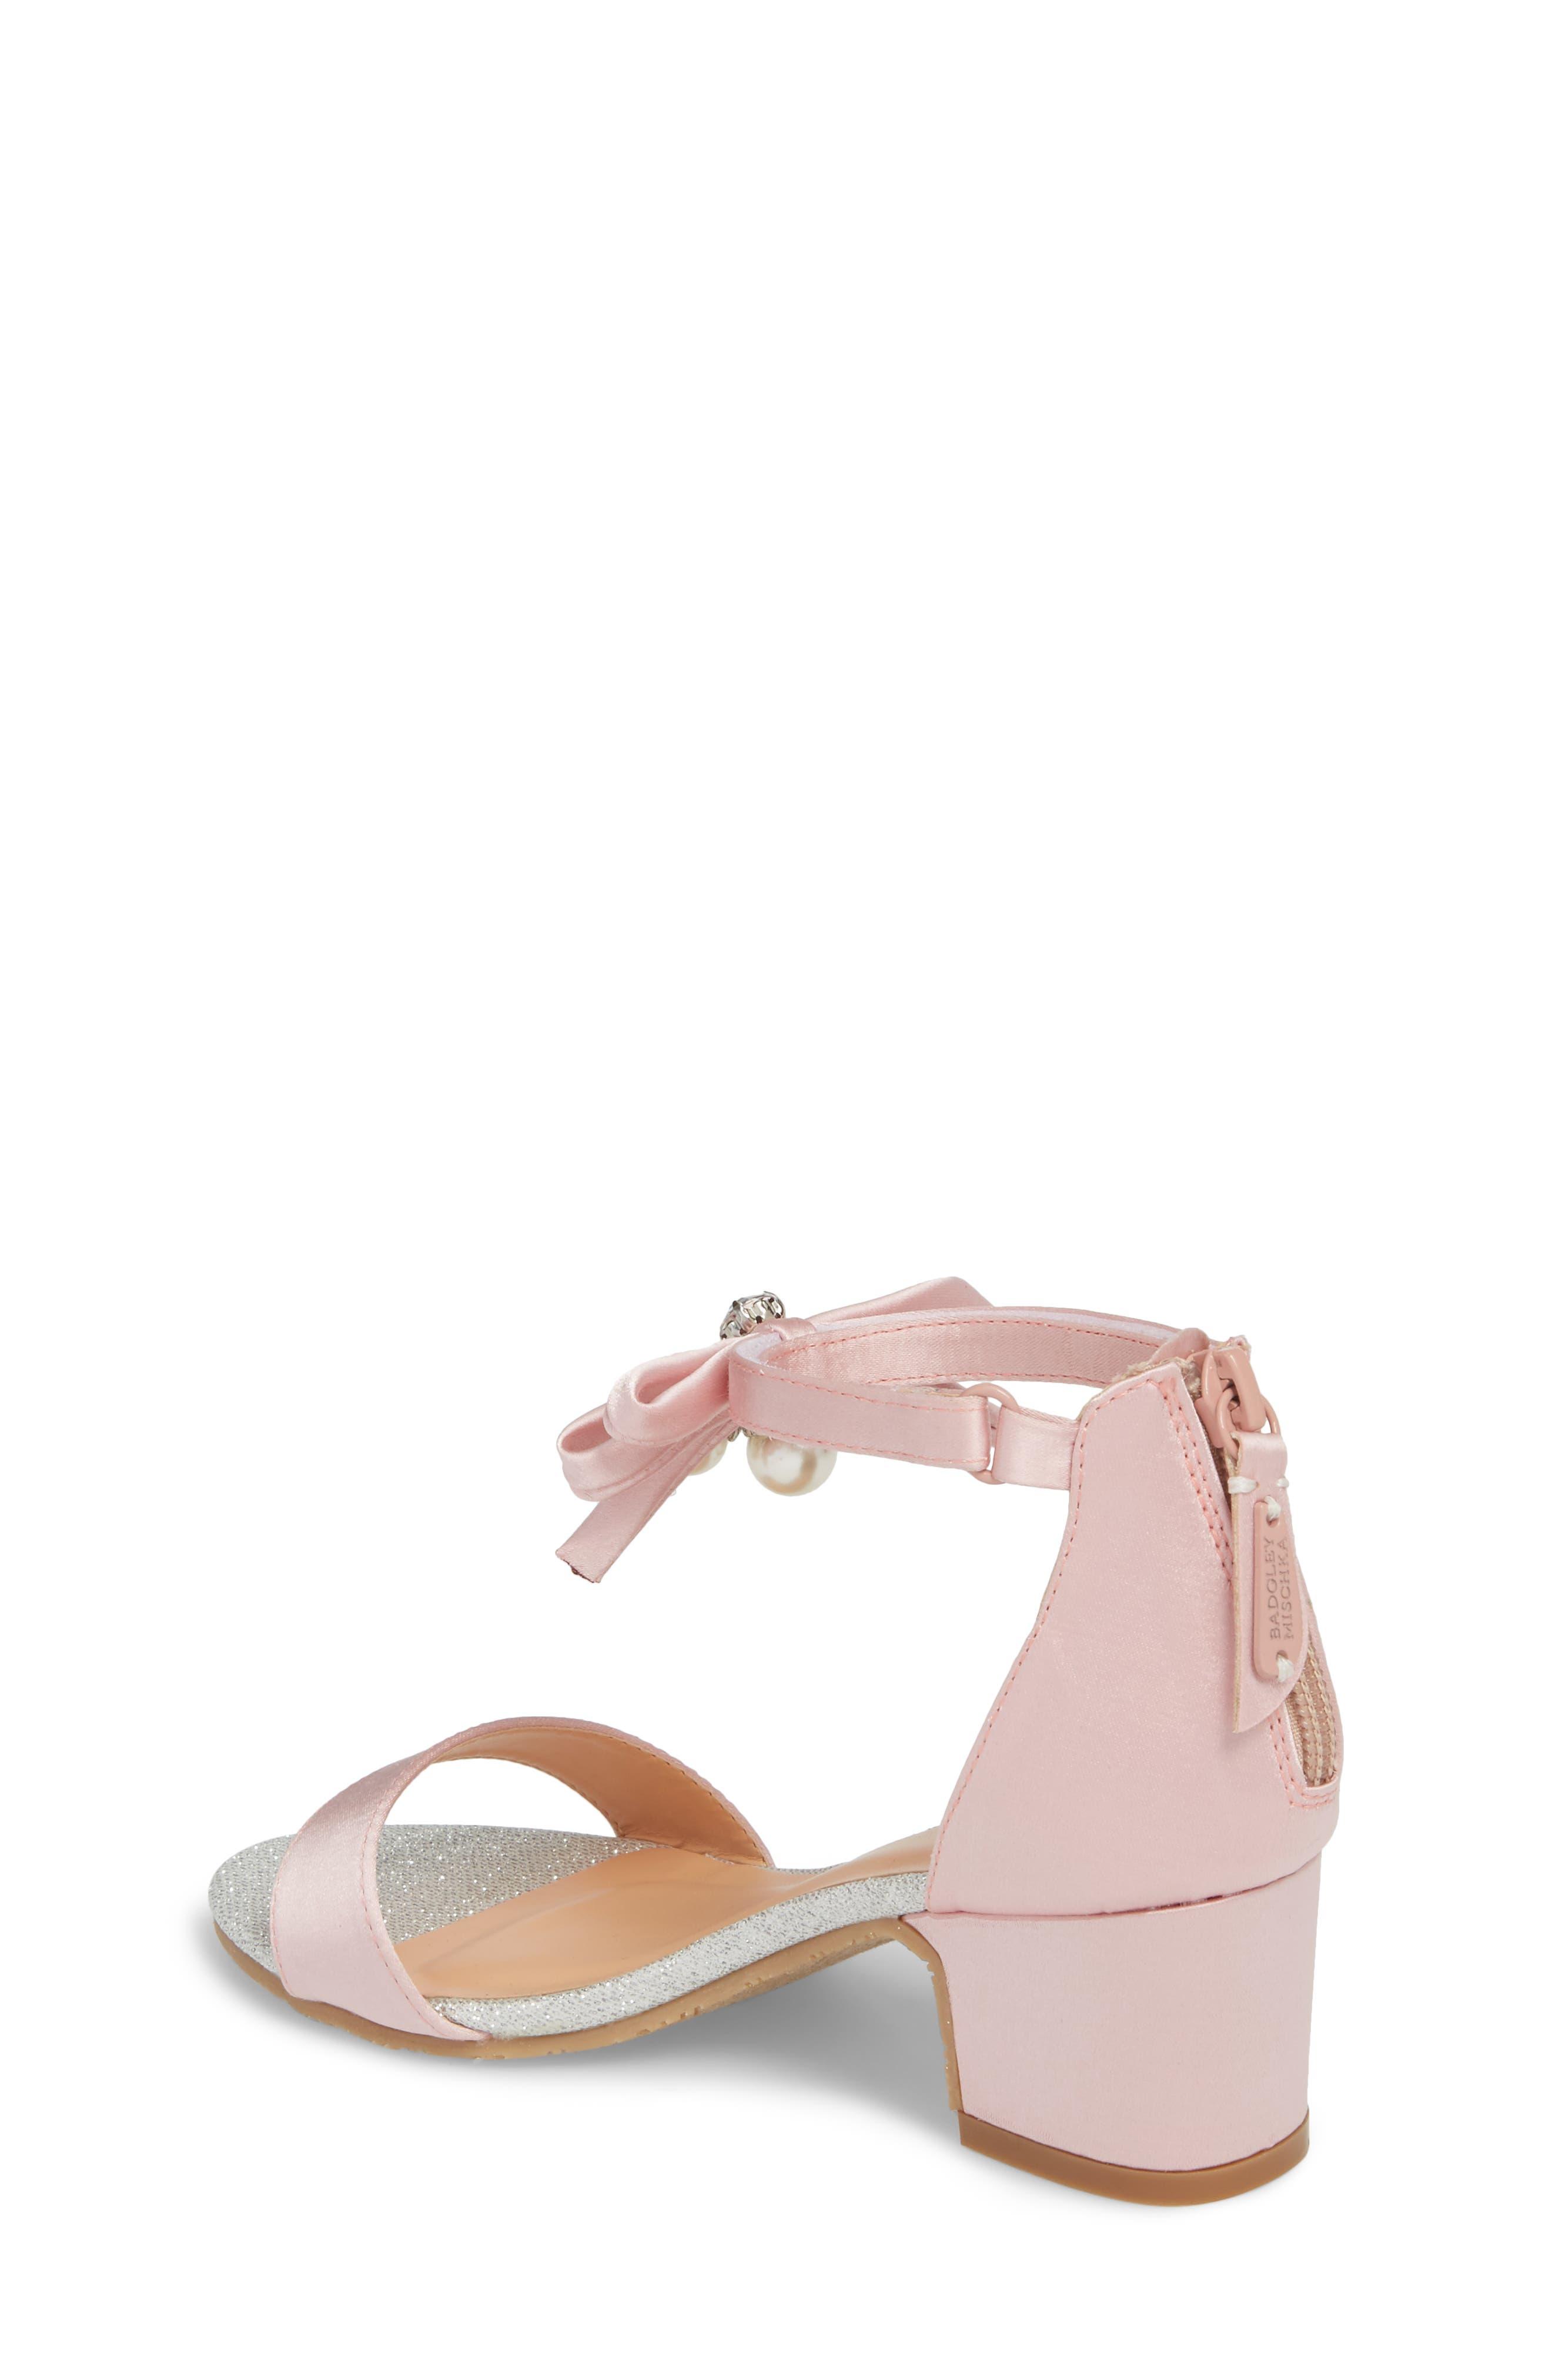 Pernia Embellished Sandal,                             Alternate thumbnail 2, color,                             PINK/ SILVER